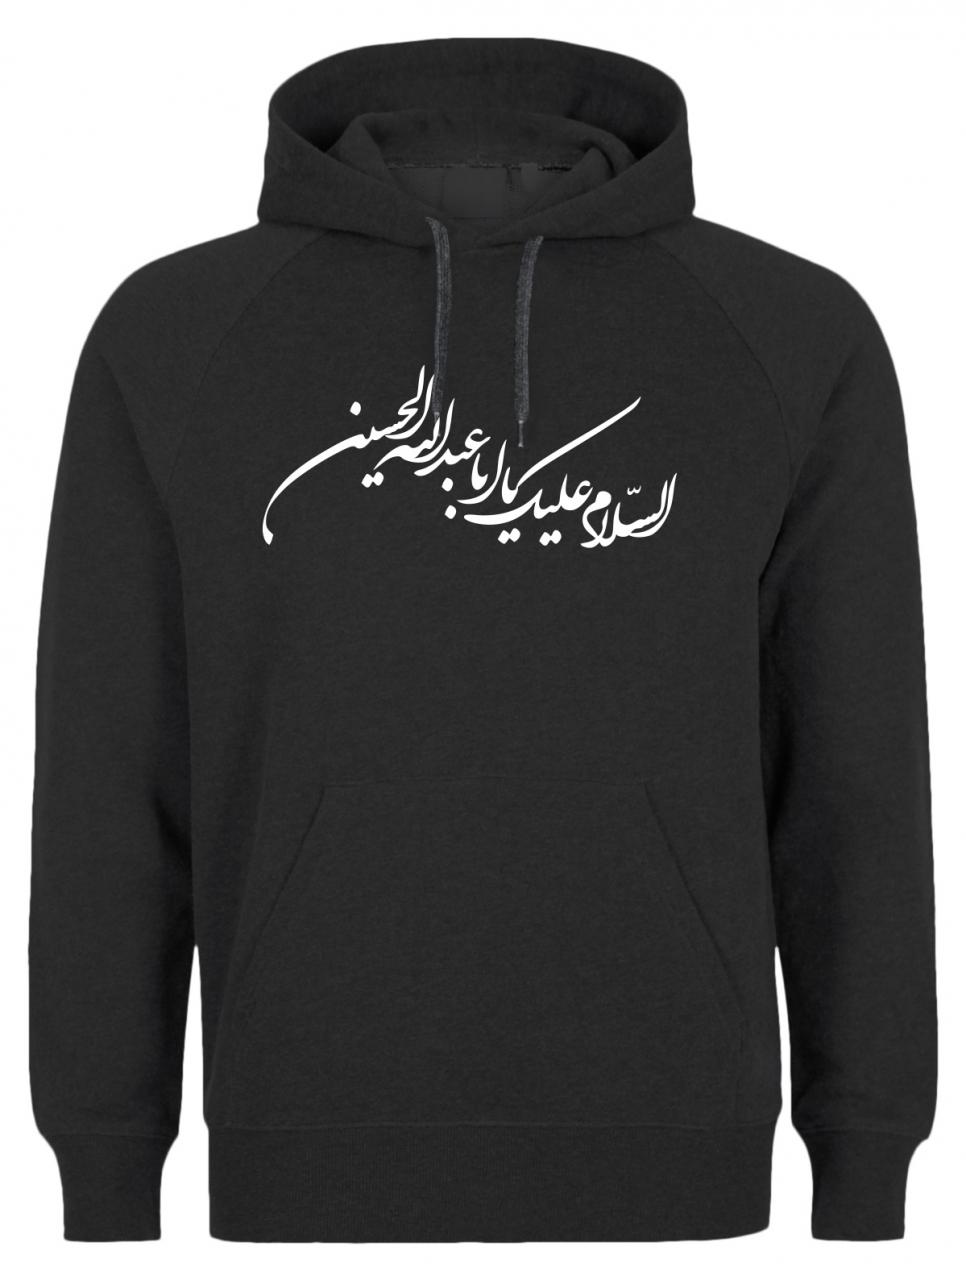 Assalamo Alaika ya Aba Abdillah Alhussein - Arabische Schrift Ashura Herren Hoodie